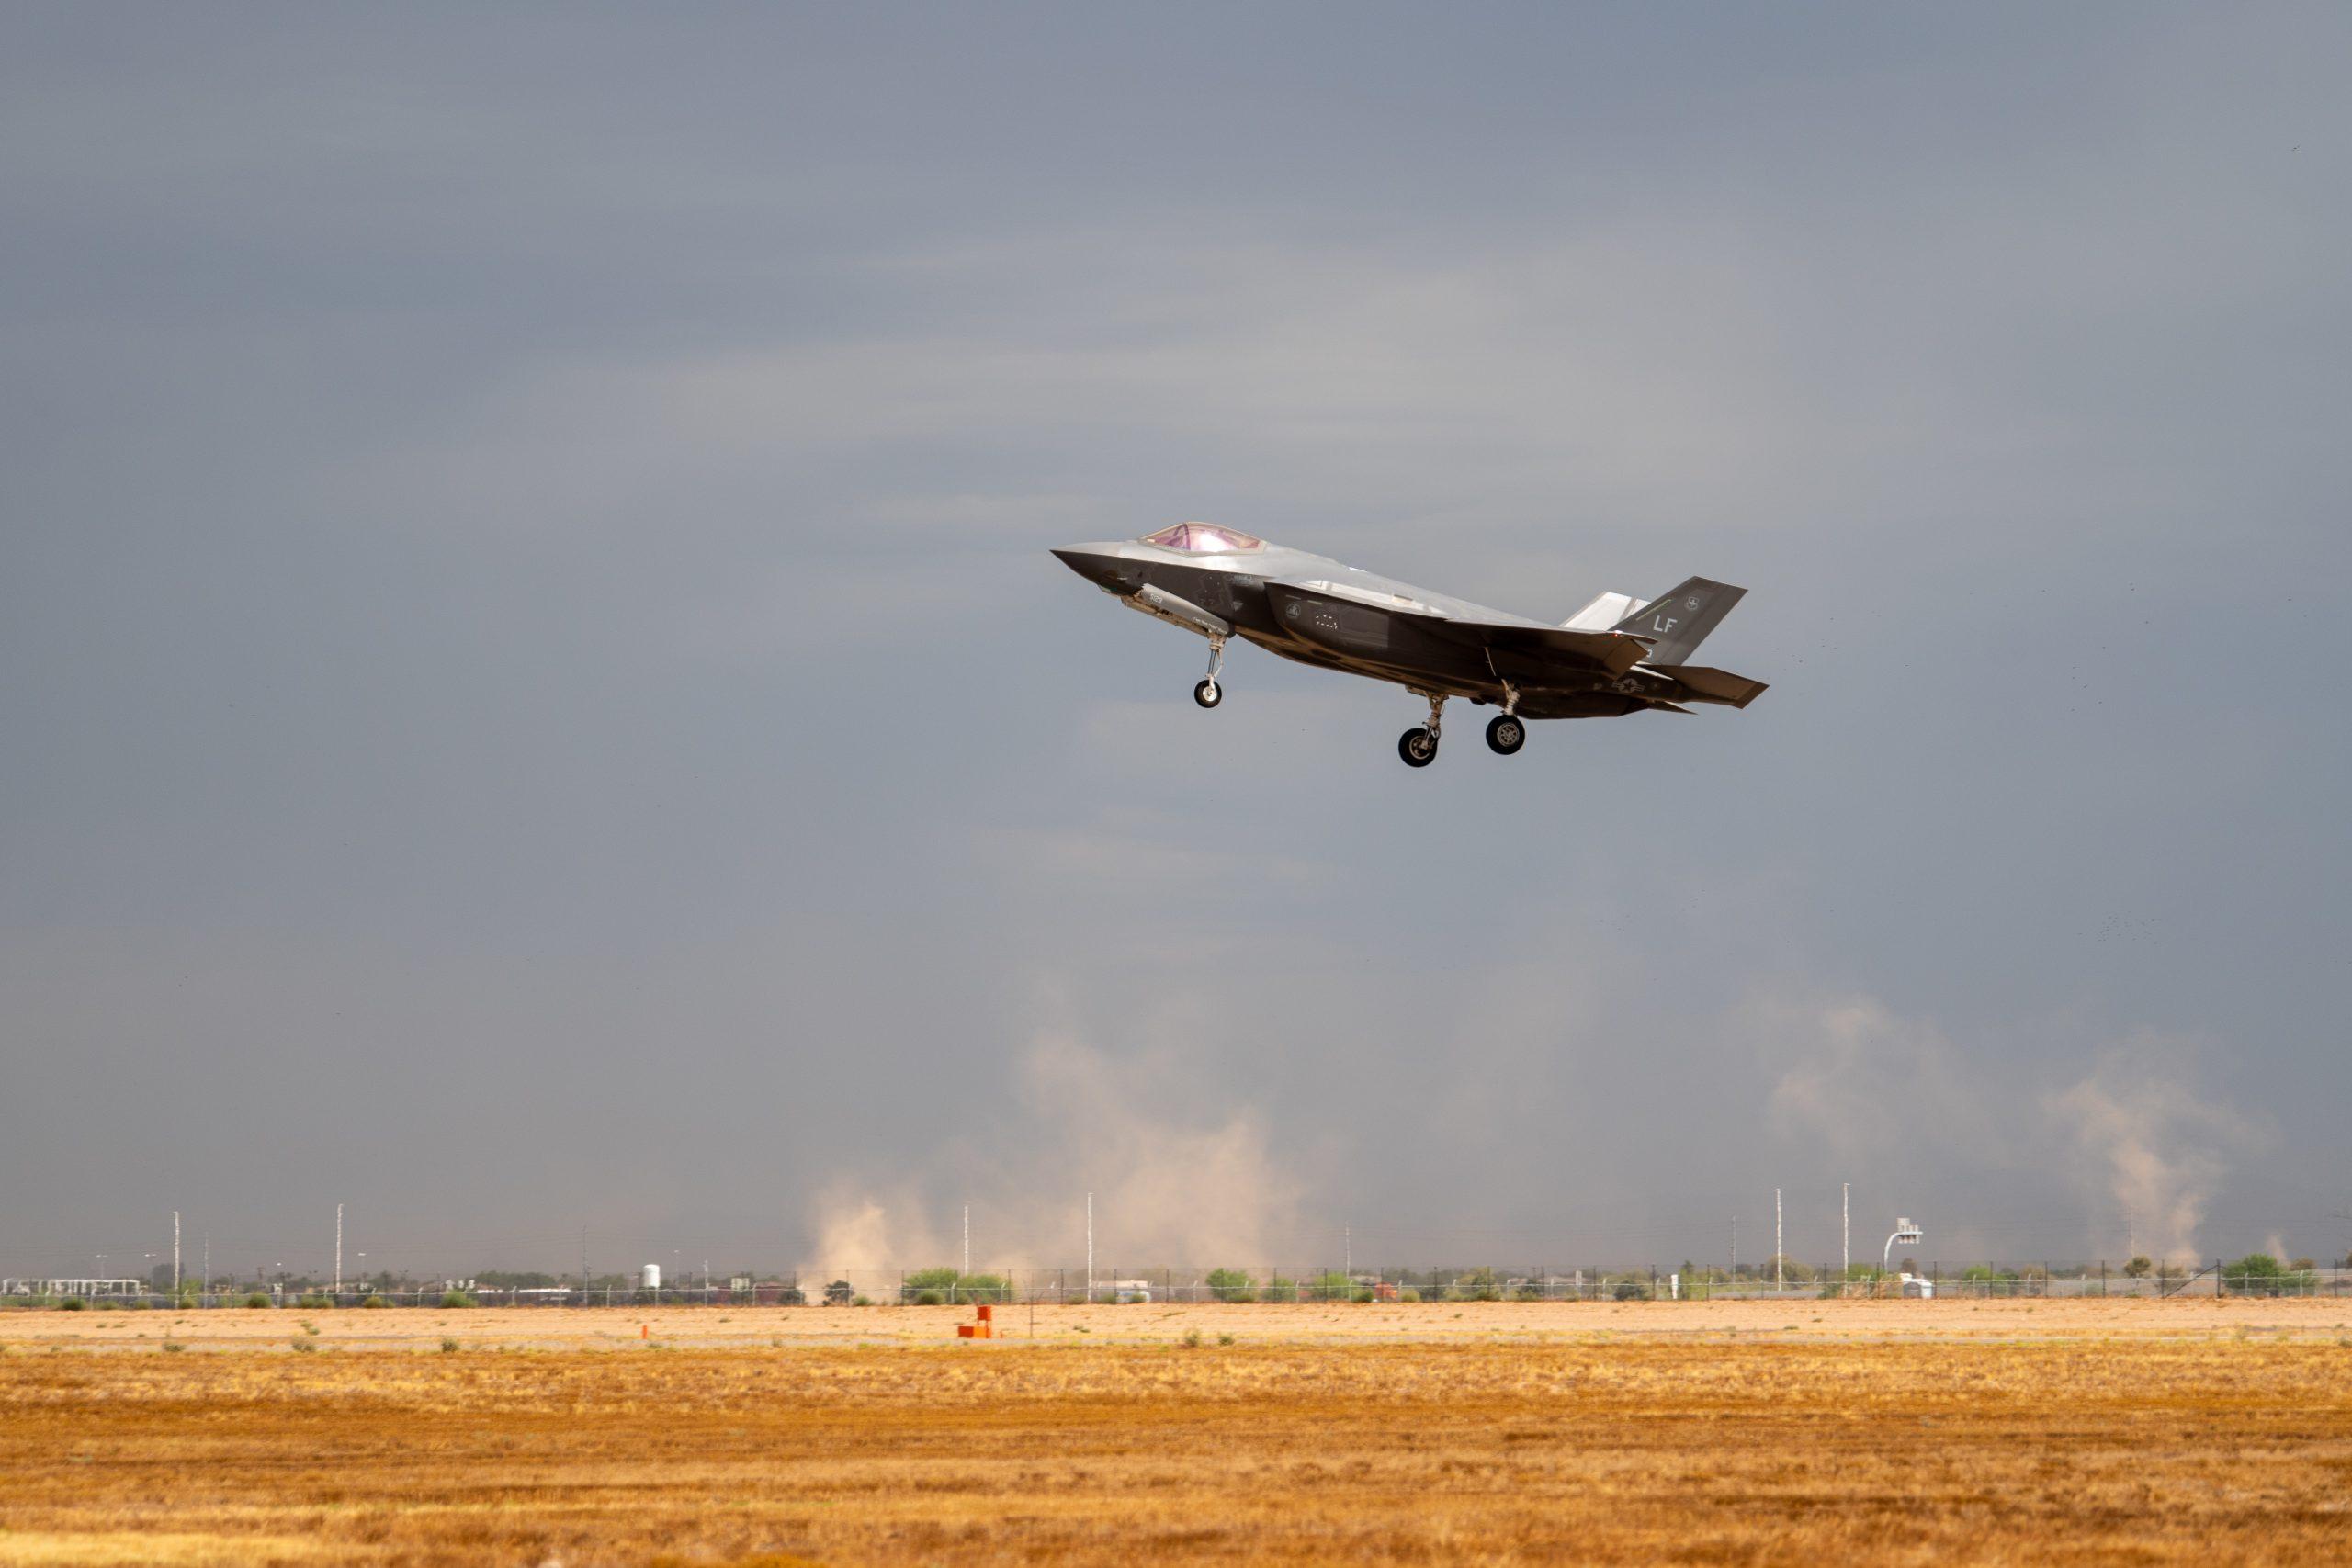 U.S. Air Force F-35A Lightning Can't Fly Near ... Lightning